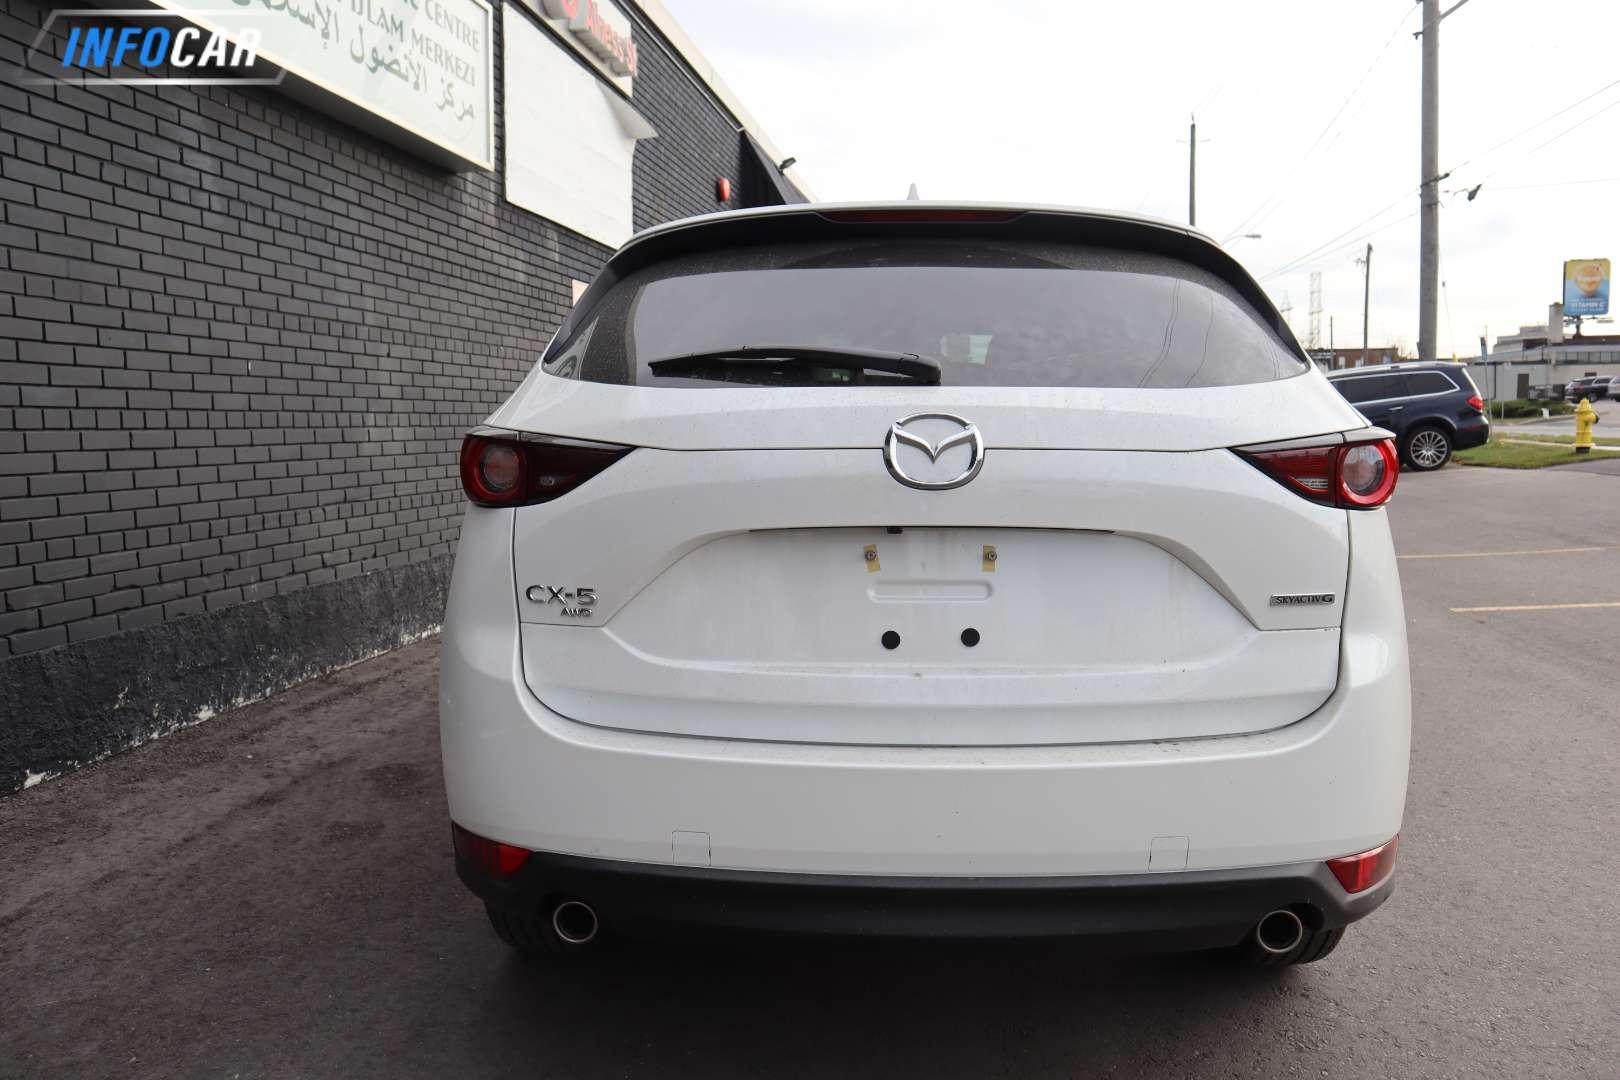 2020 Mazda CX-5  - INFOCAR - Toronto's Most Comprehensive New and Used Auto Trading Platform